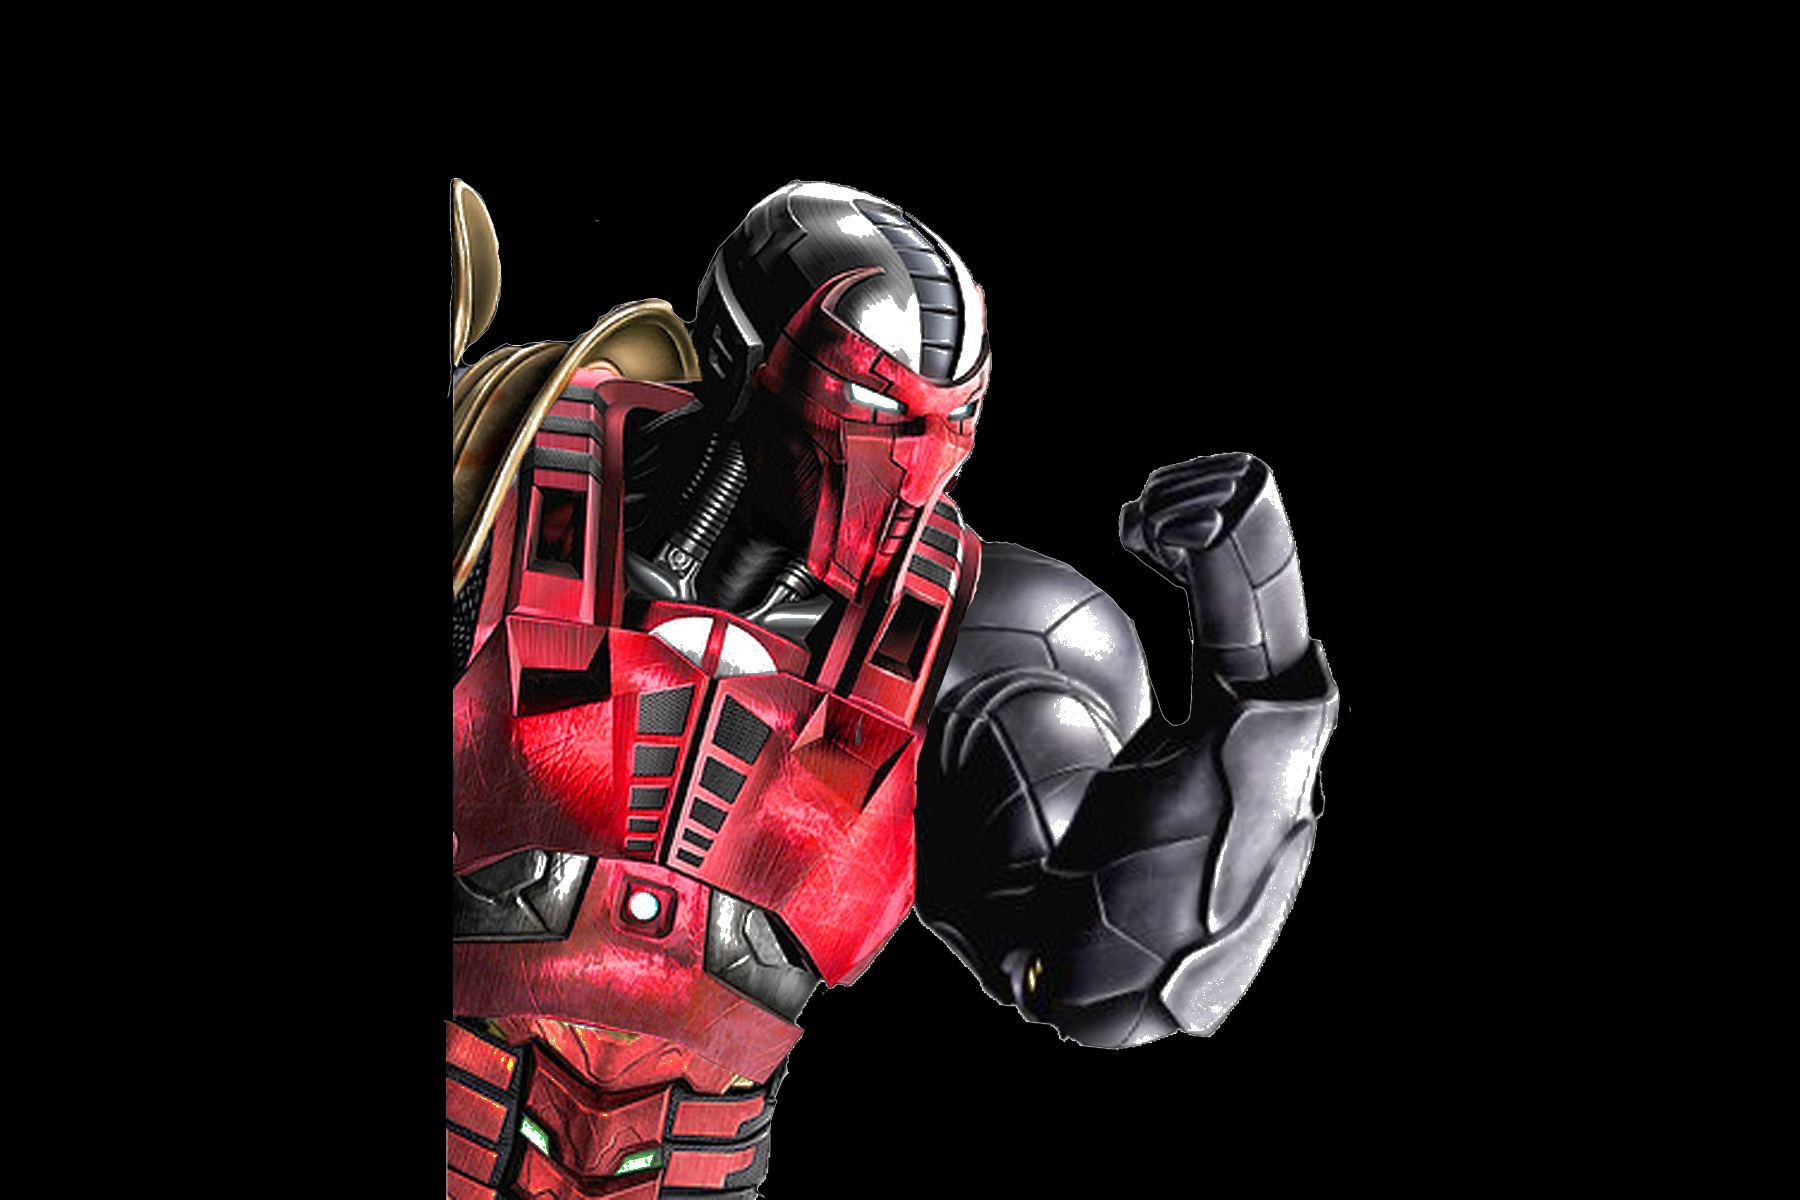 Mortal Kombat 9 Cyber Kratos - voitures-americaines info